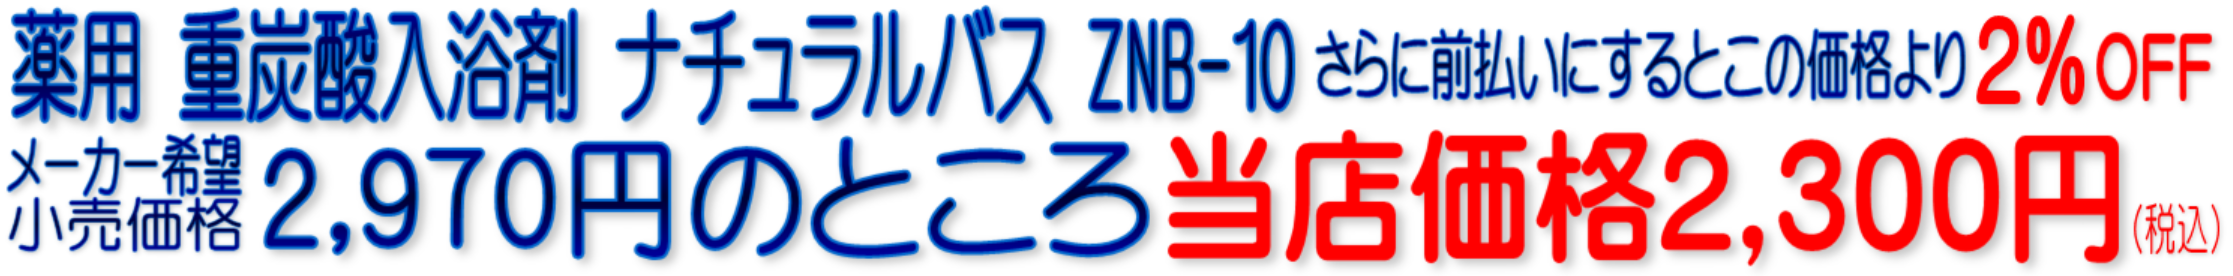 ZNB-10